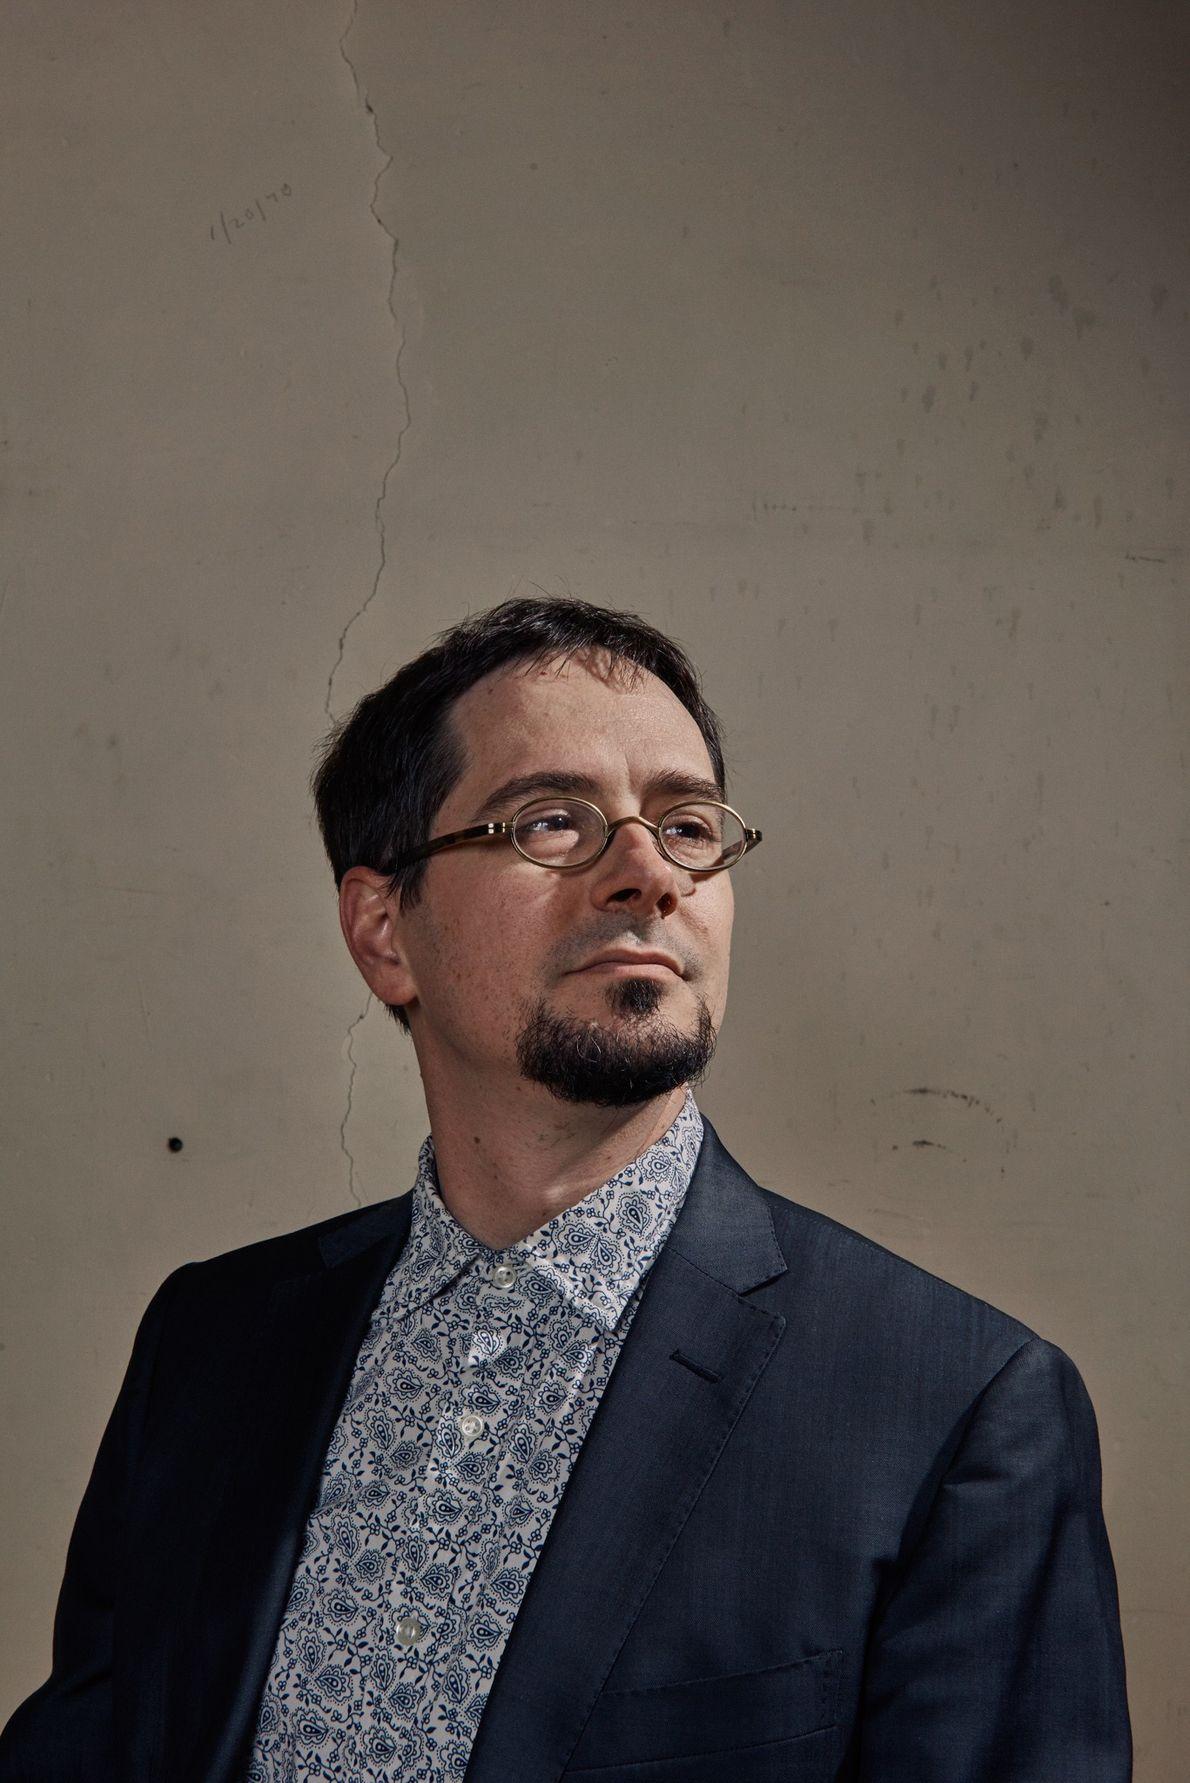 Gray Rybka, ADMX's co-spokesperson and a professor at the University of Washington.